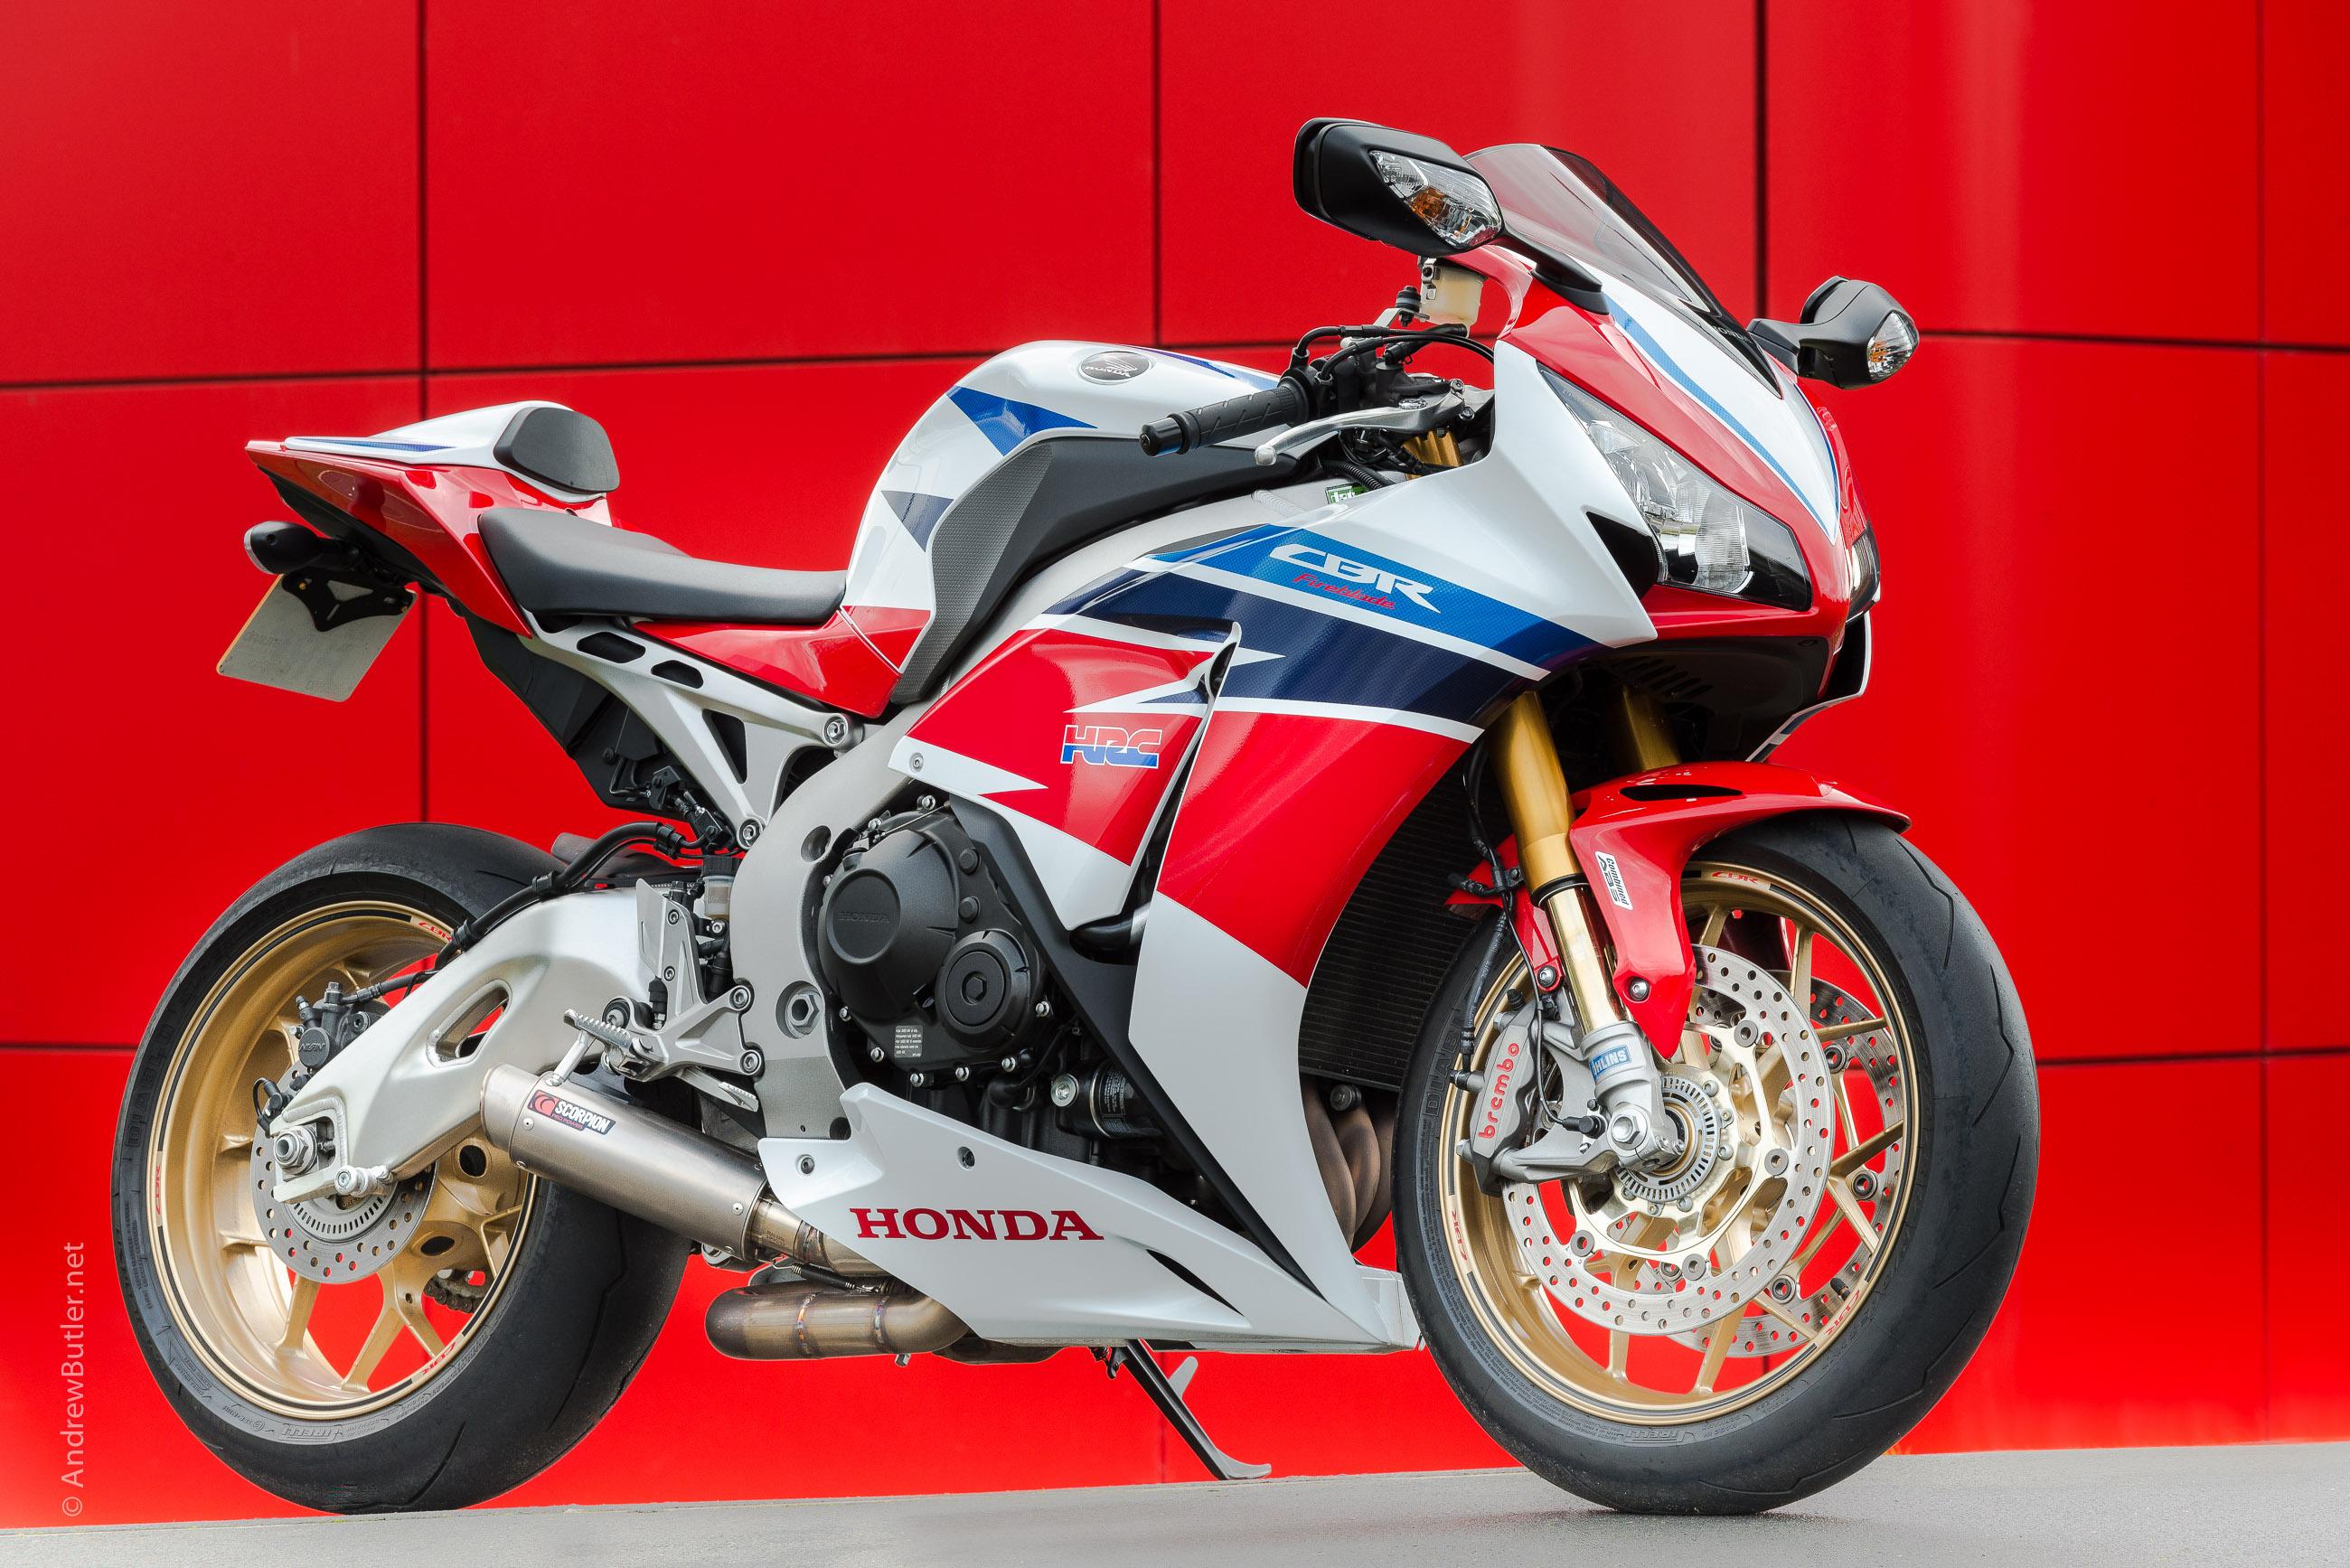 Motorbike Photographer Honda CBR1000 RR SP photographed by motorbike photographer Andrew Butler